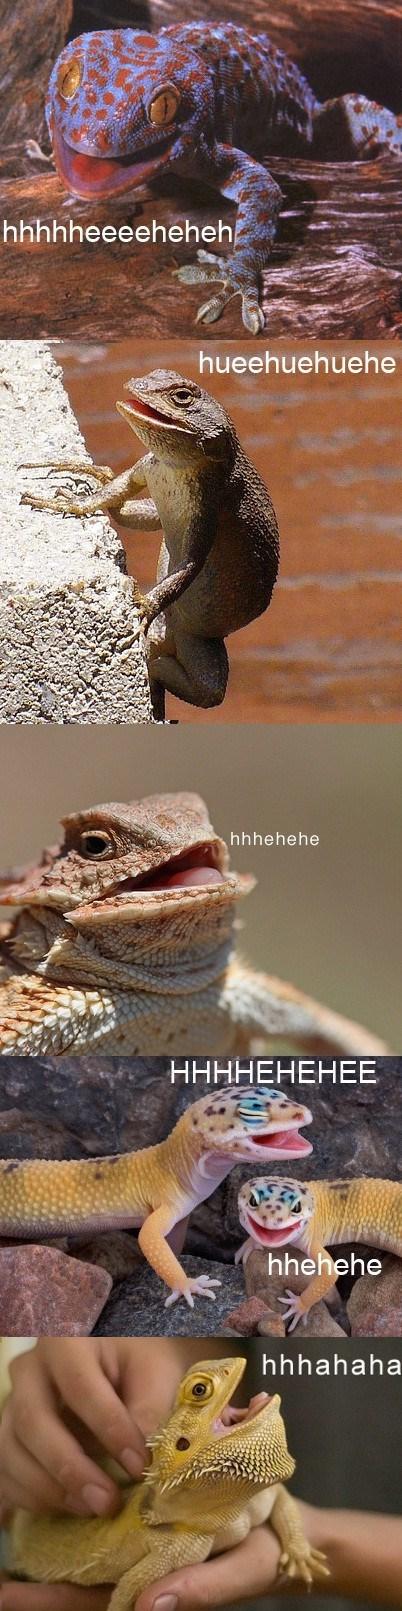 lizards wtf giggle laugh reptiles weird - 7022804224